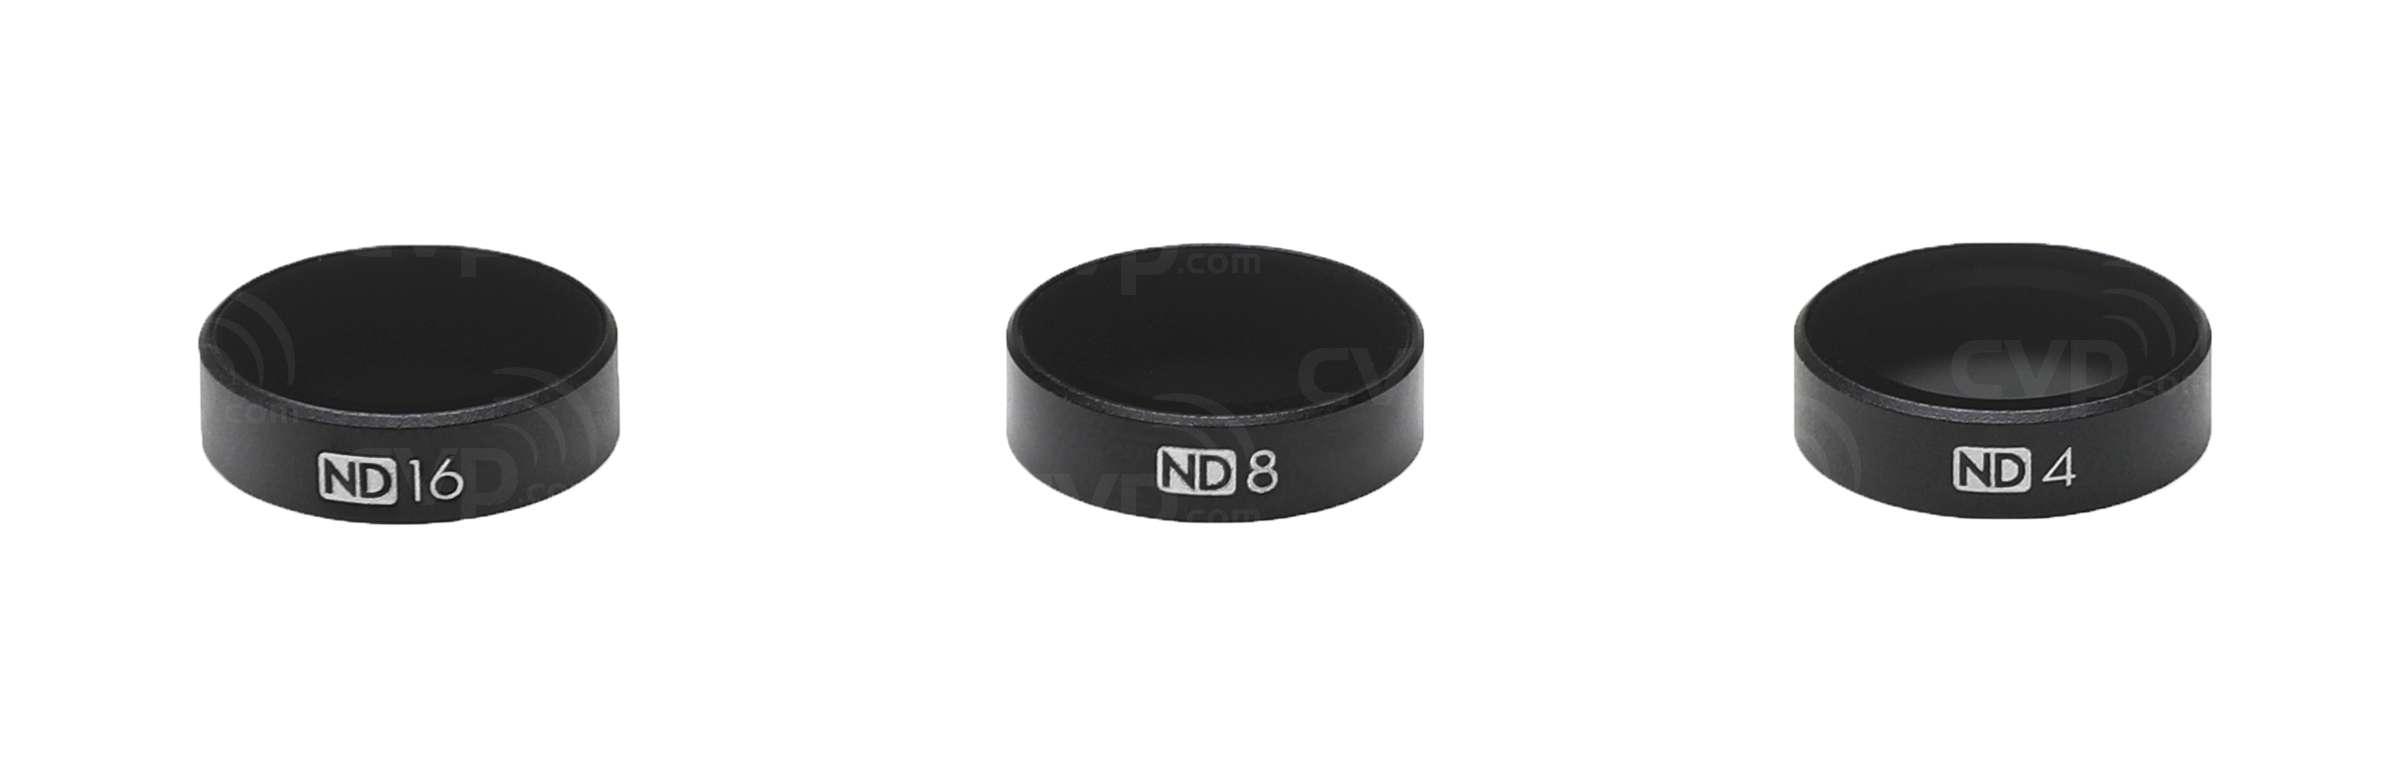 Buy Dji Mavic Air Nd Filters Set 4 8 16 Nisi Filter Kit For Phantom Pro